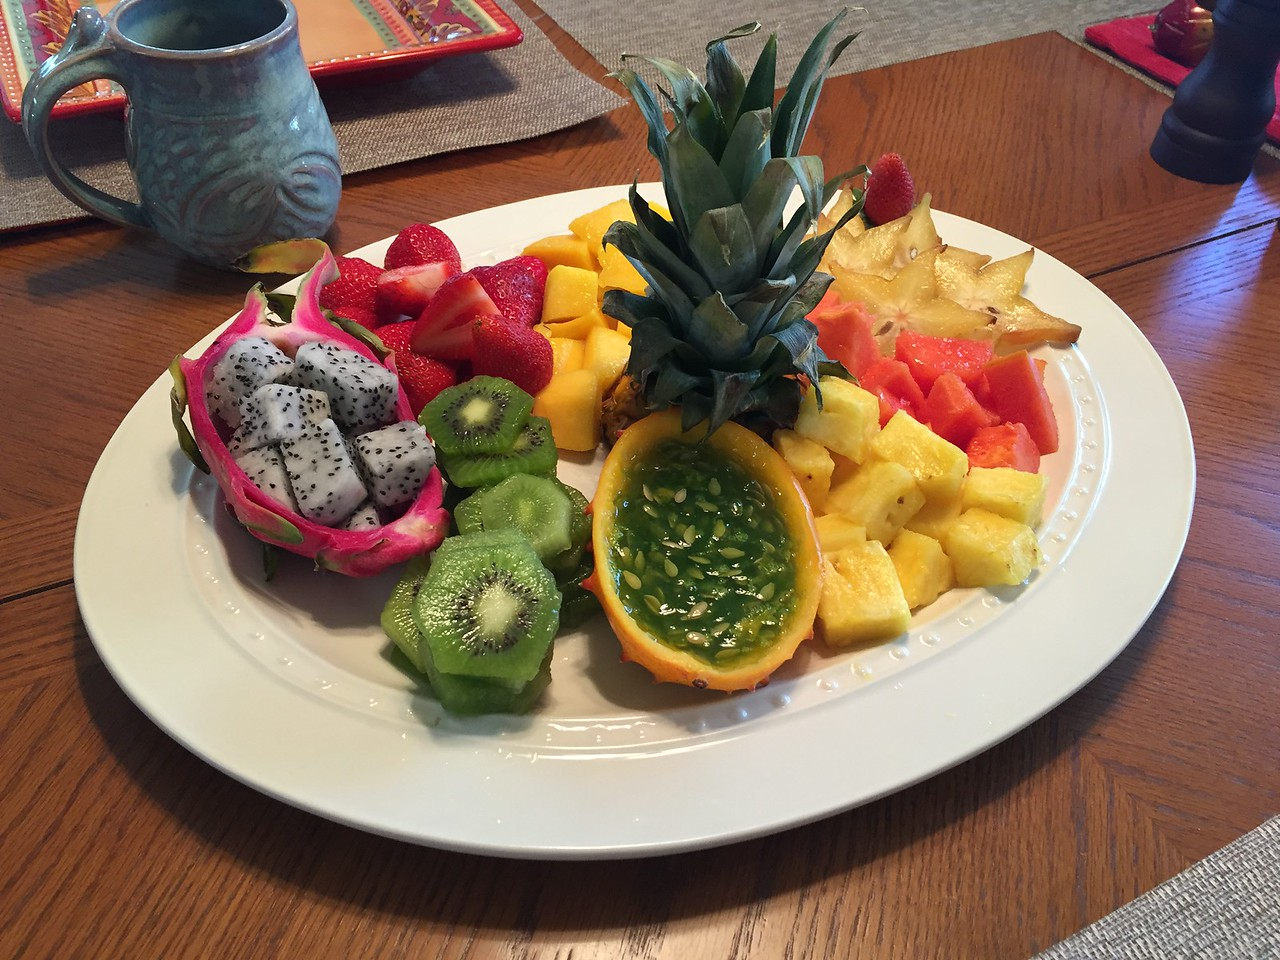 Dragon fruit, strawberries, kiwi, mango, kiwano mellon, star fruit, papaya and piña.